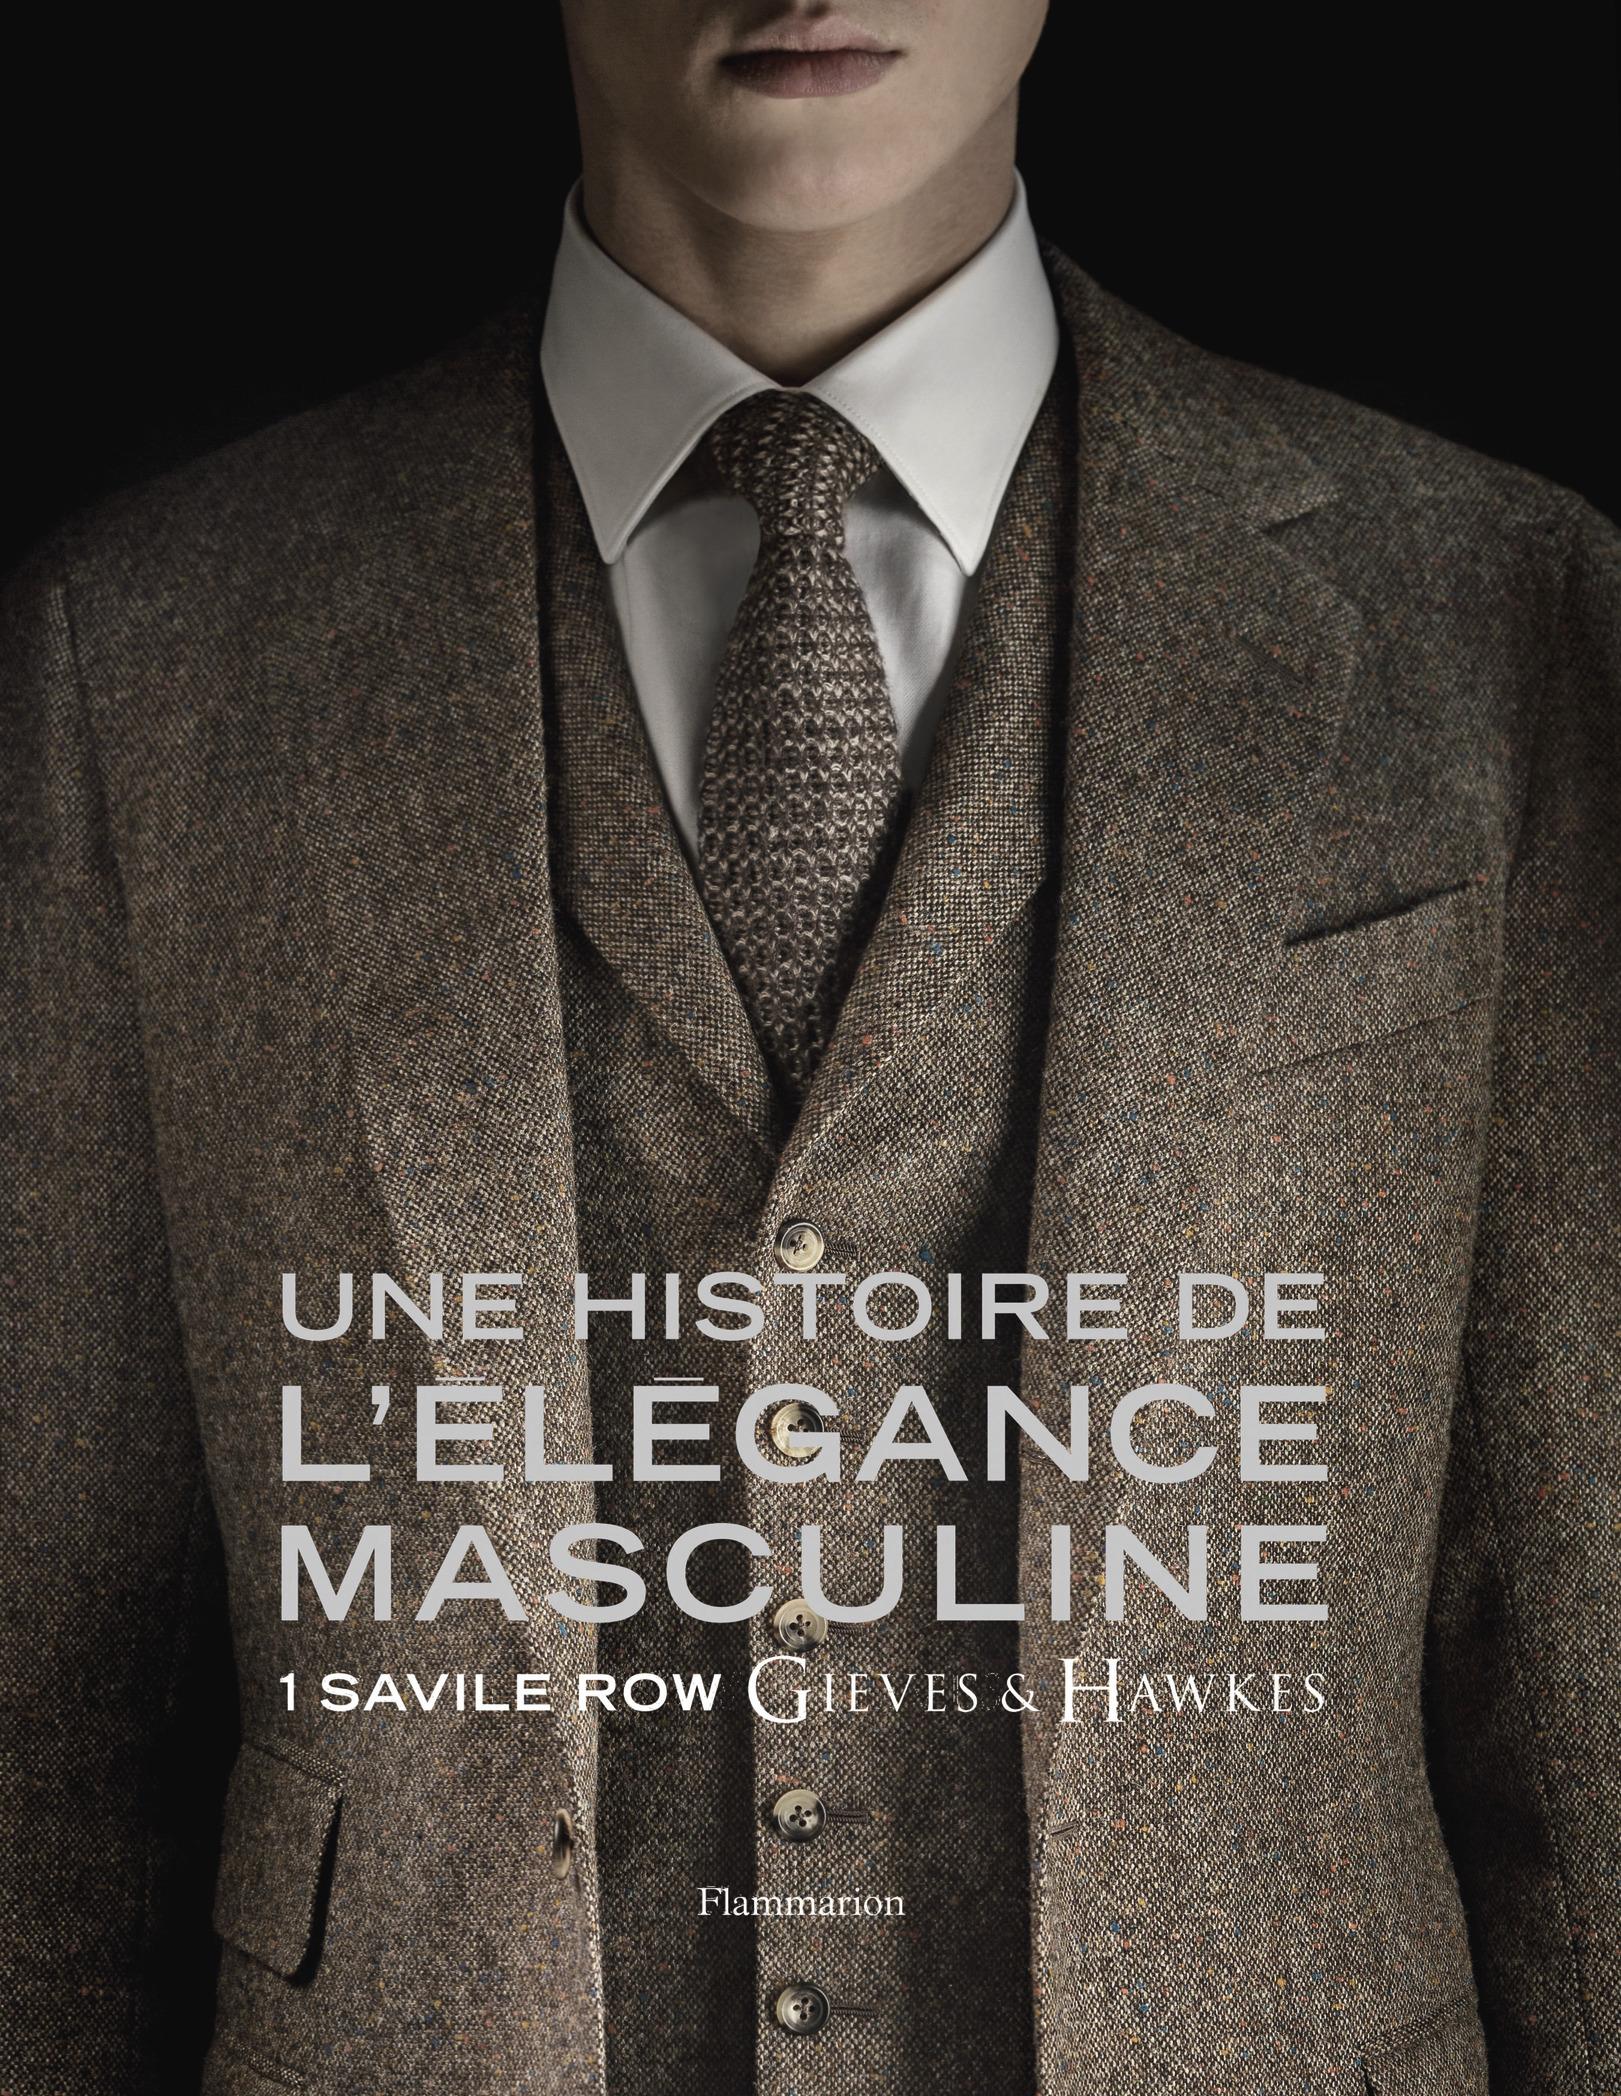 UNE HISTOIRE DE L'ELEGANCE MASCULINE - 1 SAVILE ROW, GIEVES & HAWKES